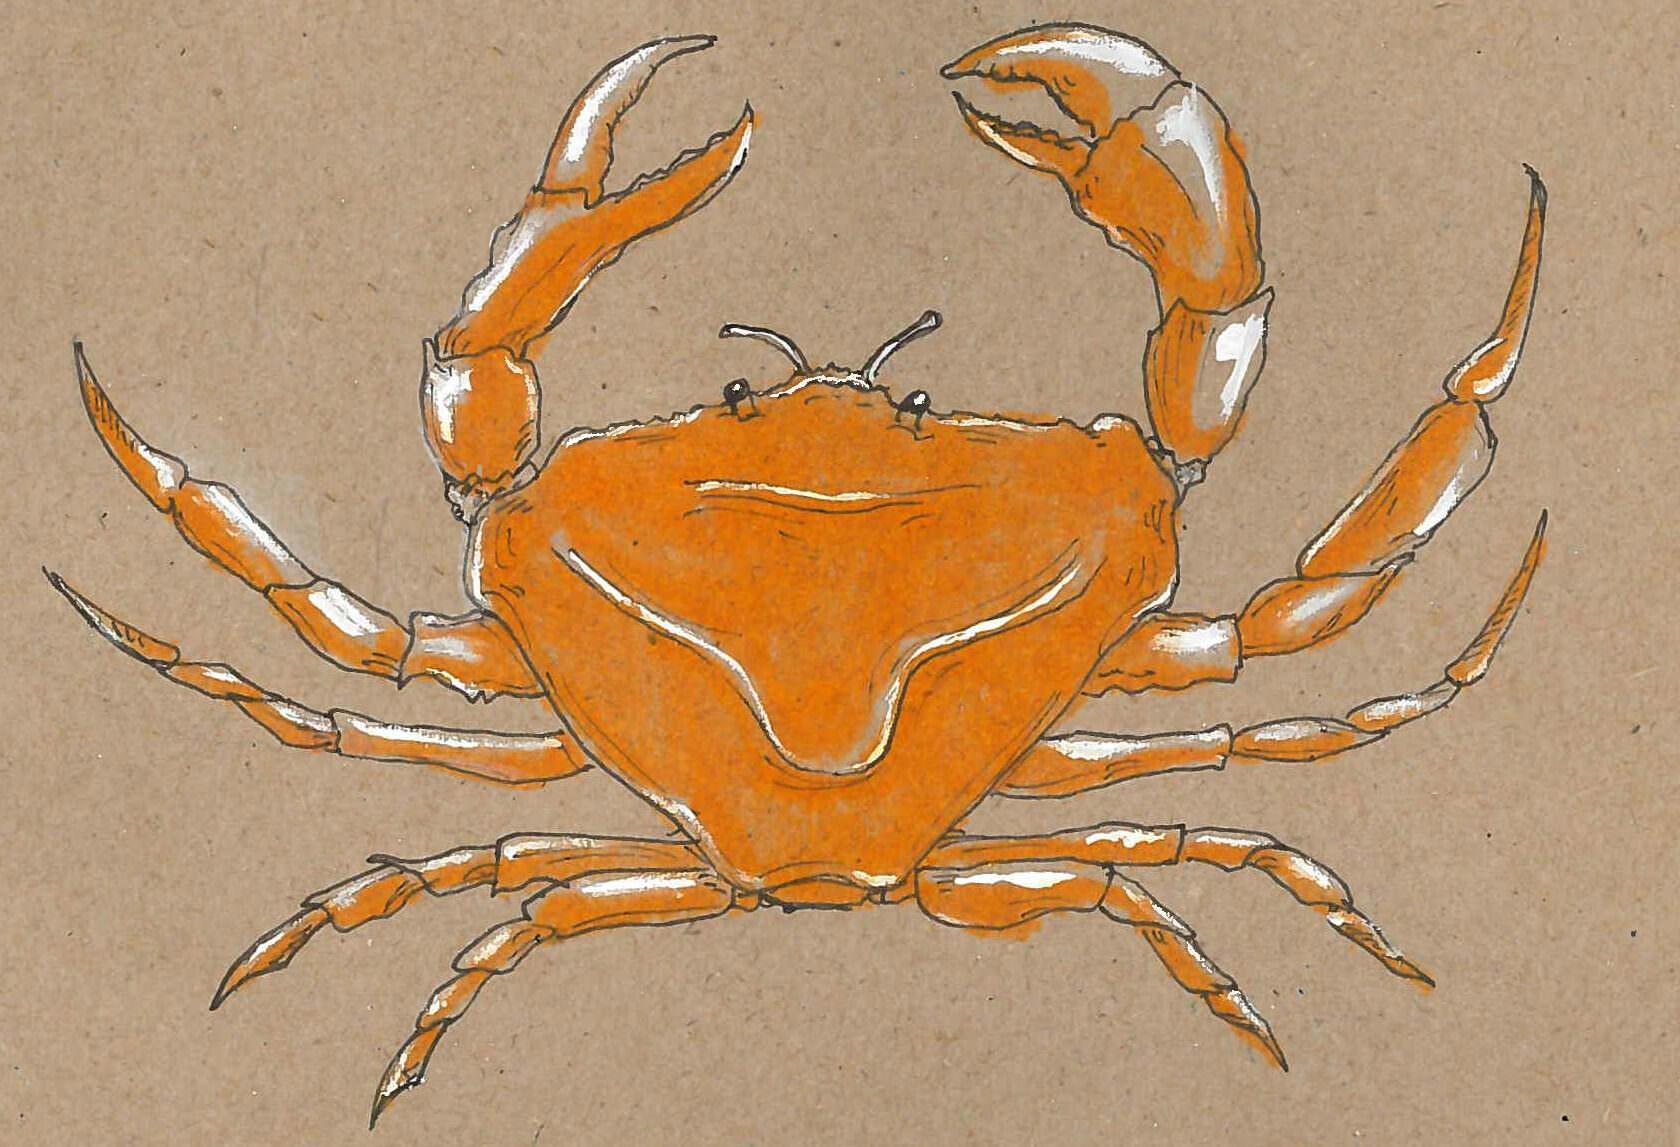 Feelin' crabby. —Ella